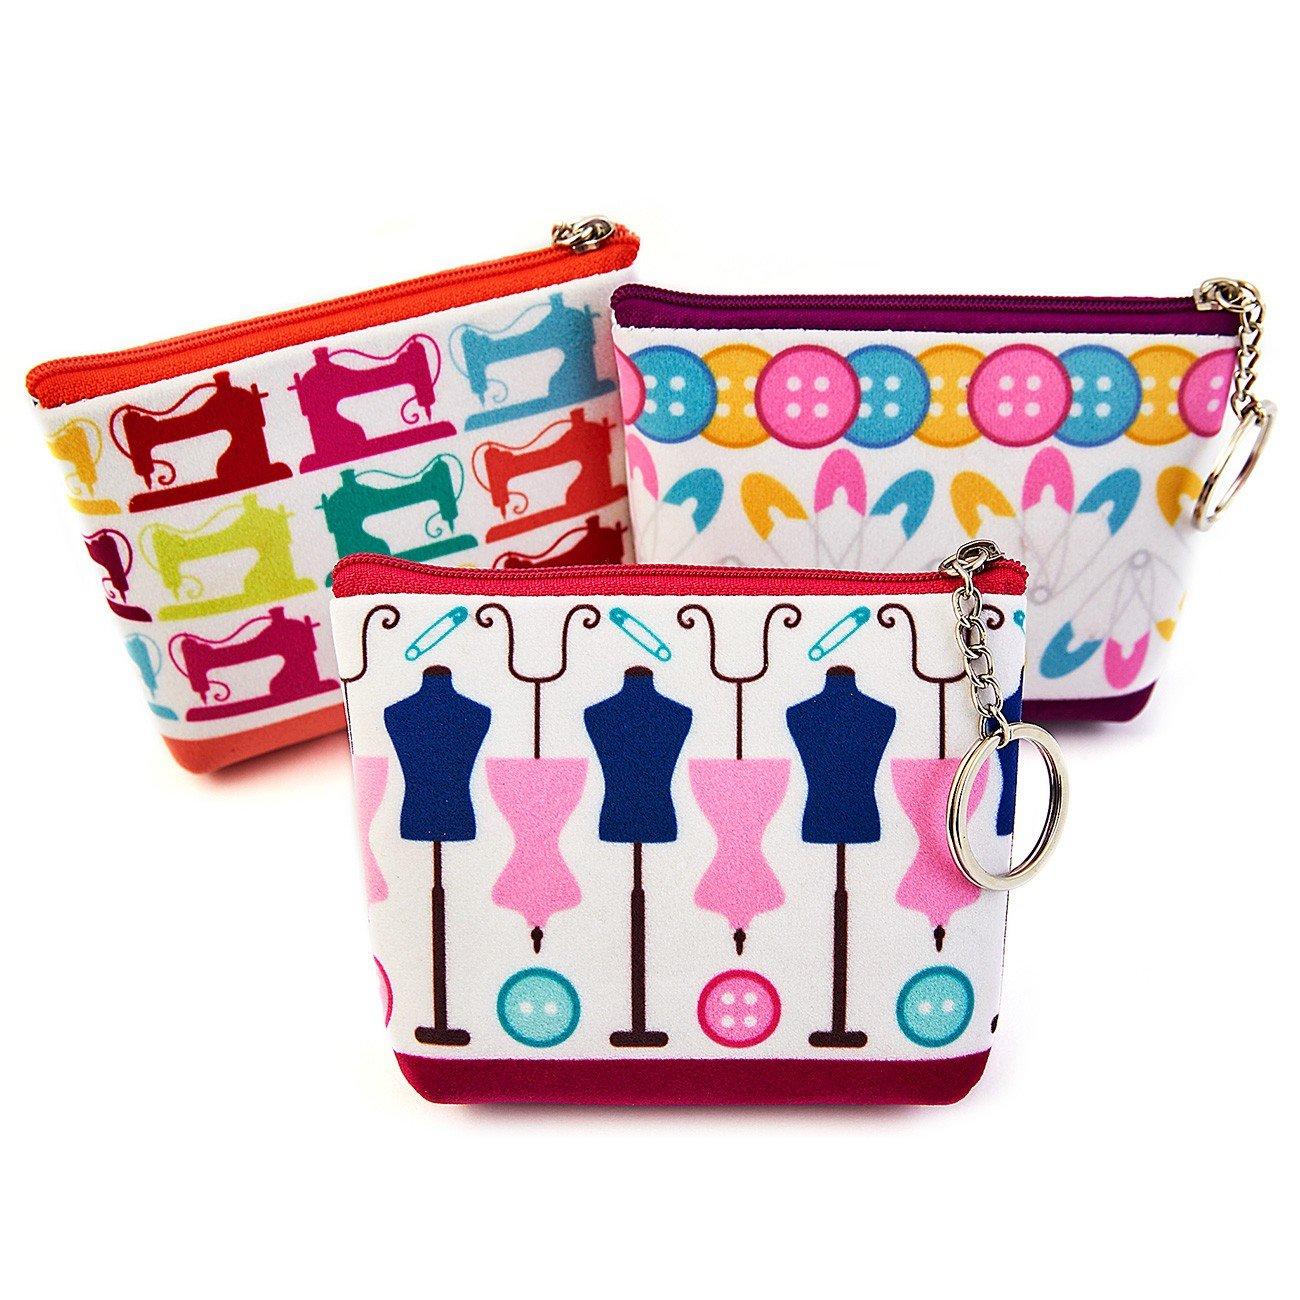 Novelty Sewing Zipper Pouch - 3 Designs!